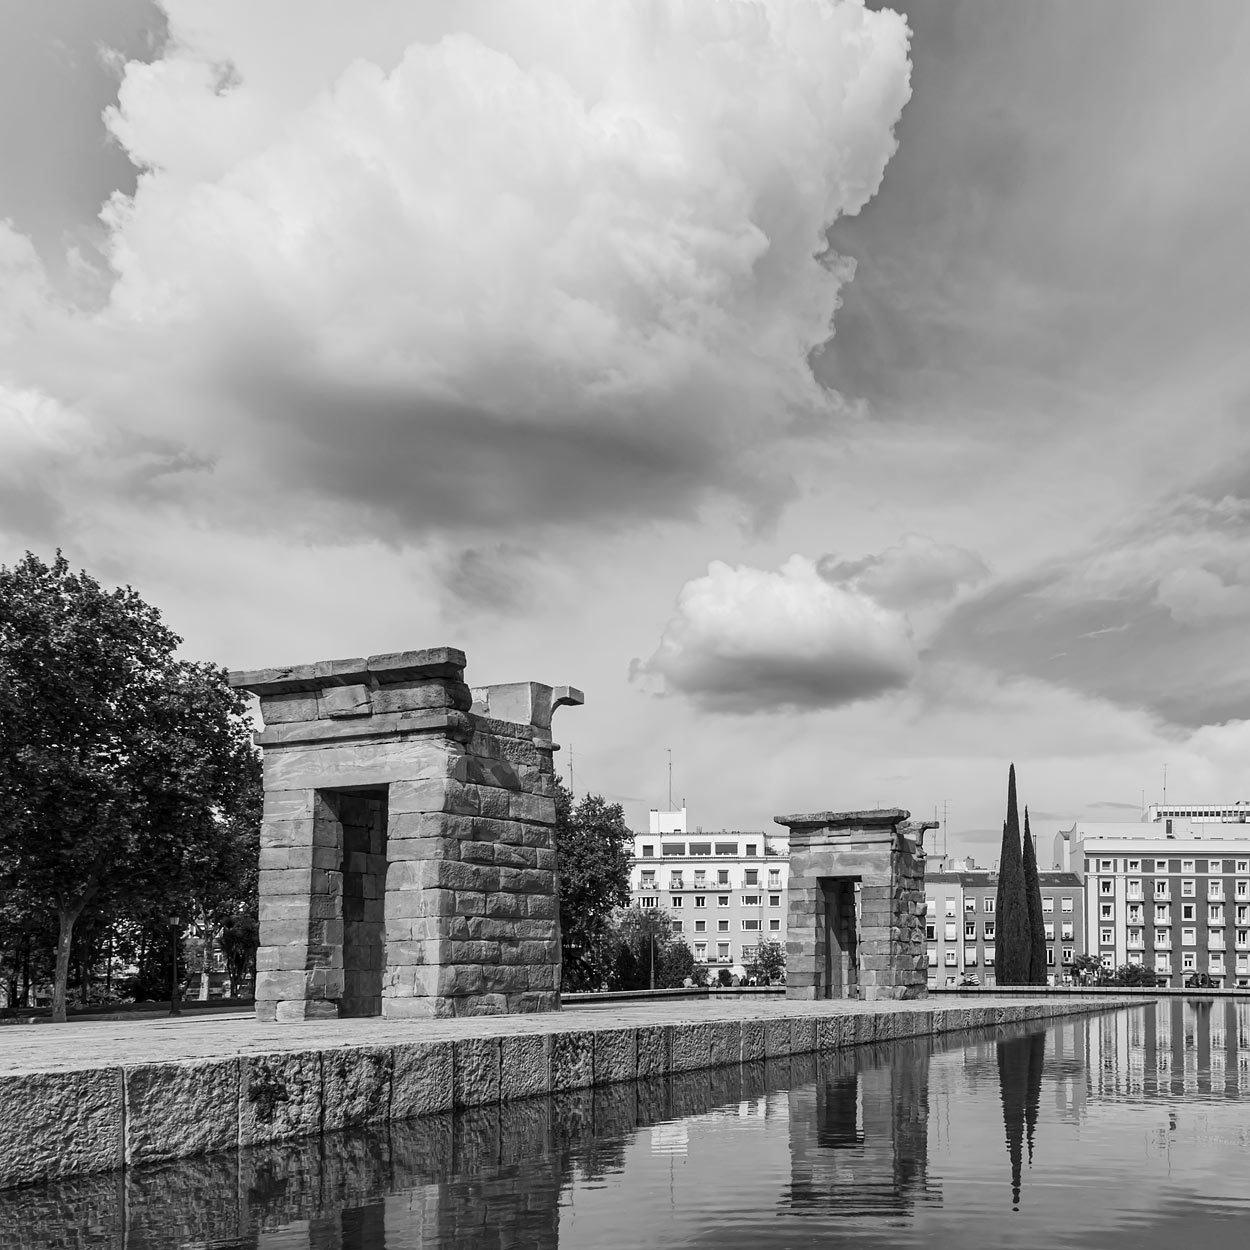 Madrid, Spain - The Temple of Debod